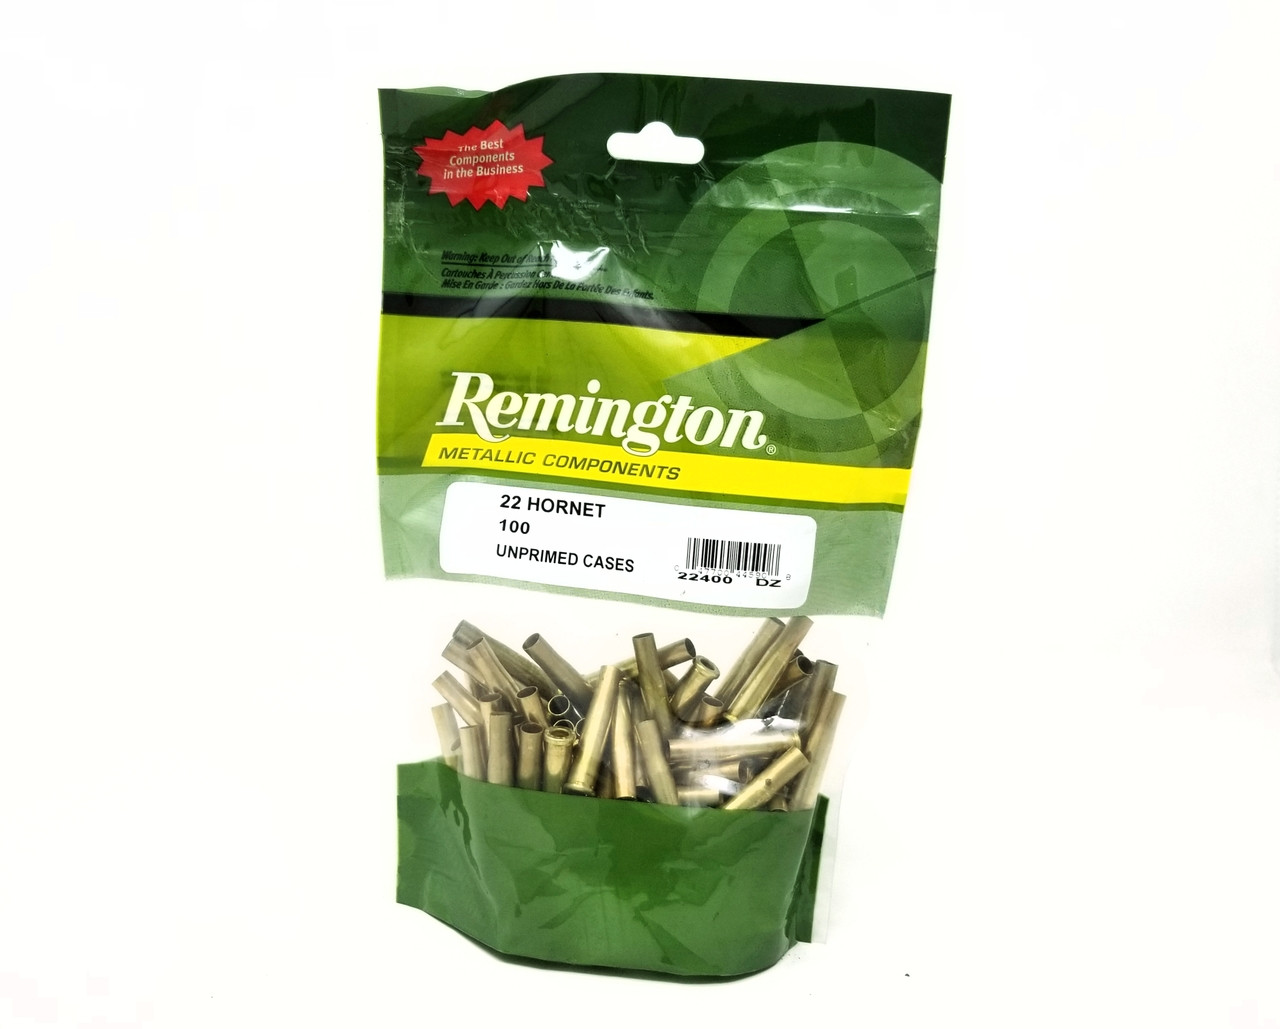 Remington 22 Hornet New Reloading Brass RC22H 22400 Brass 100 Pieces